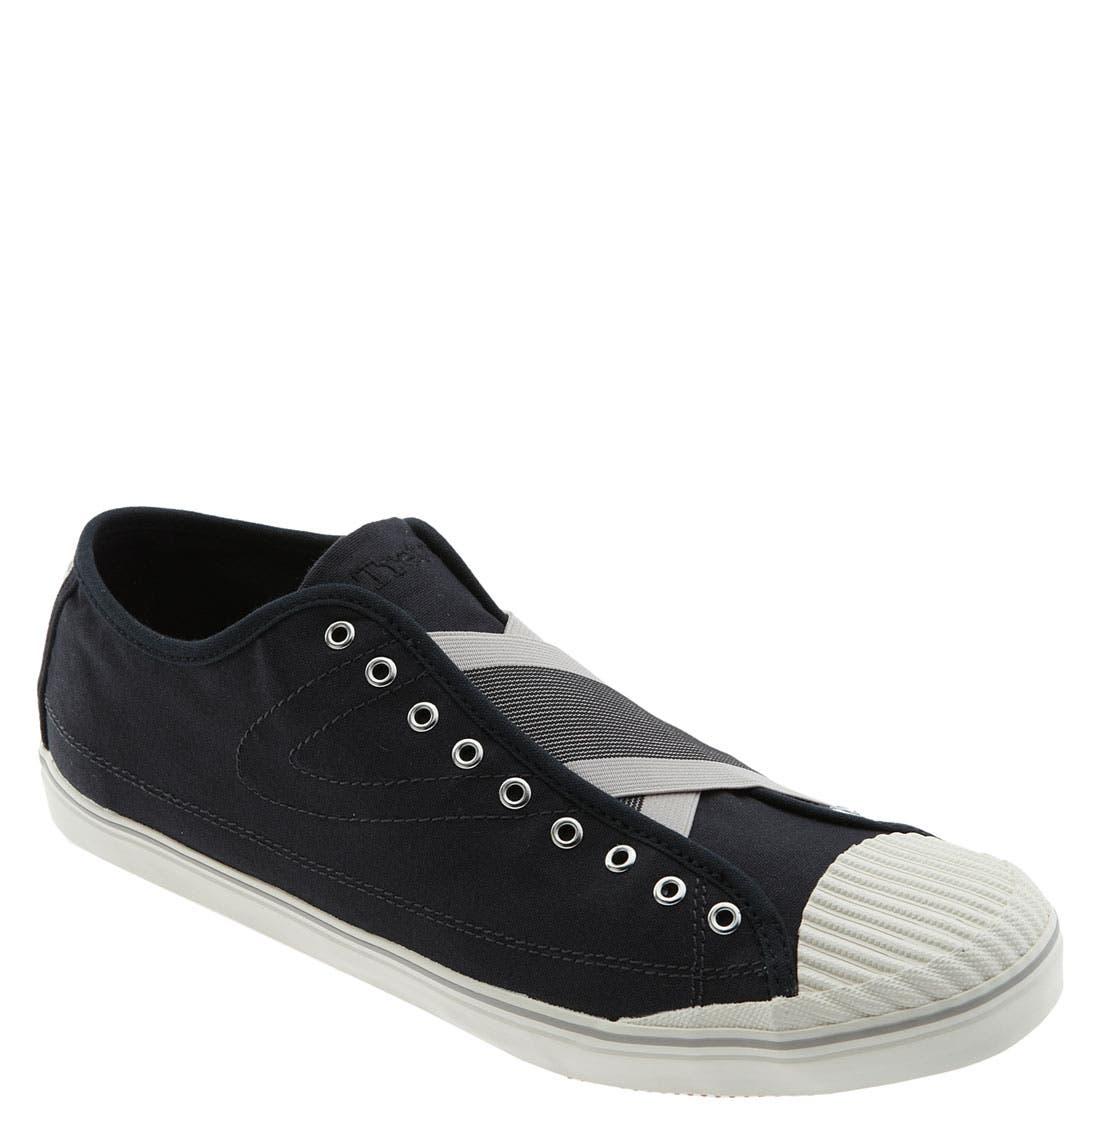 'Skymra' Slip-On Sneaker, Main, color, 001